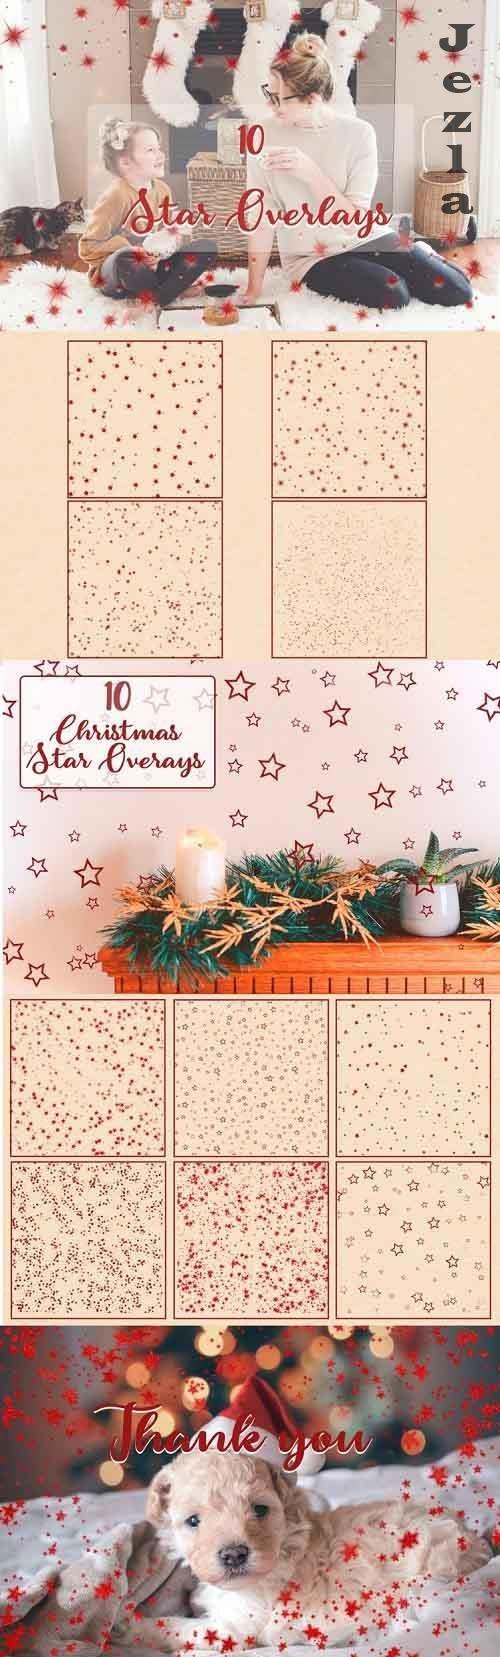 Christmas Star Photo Overlays | Red Metallic Star Overlays - 919767